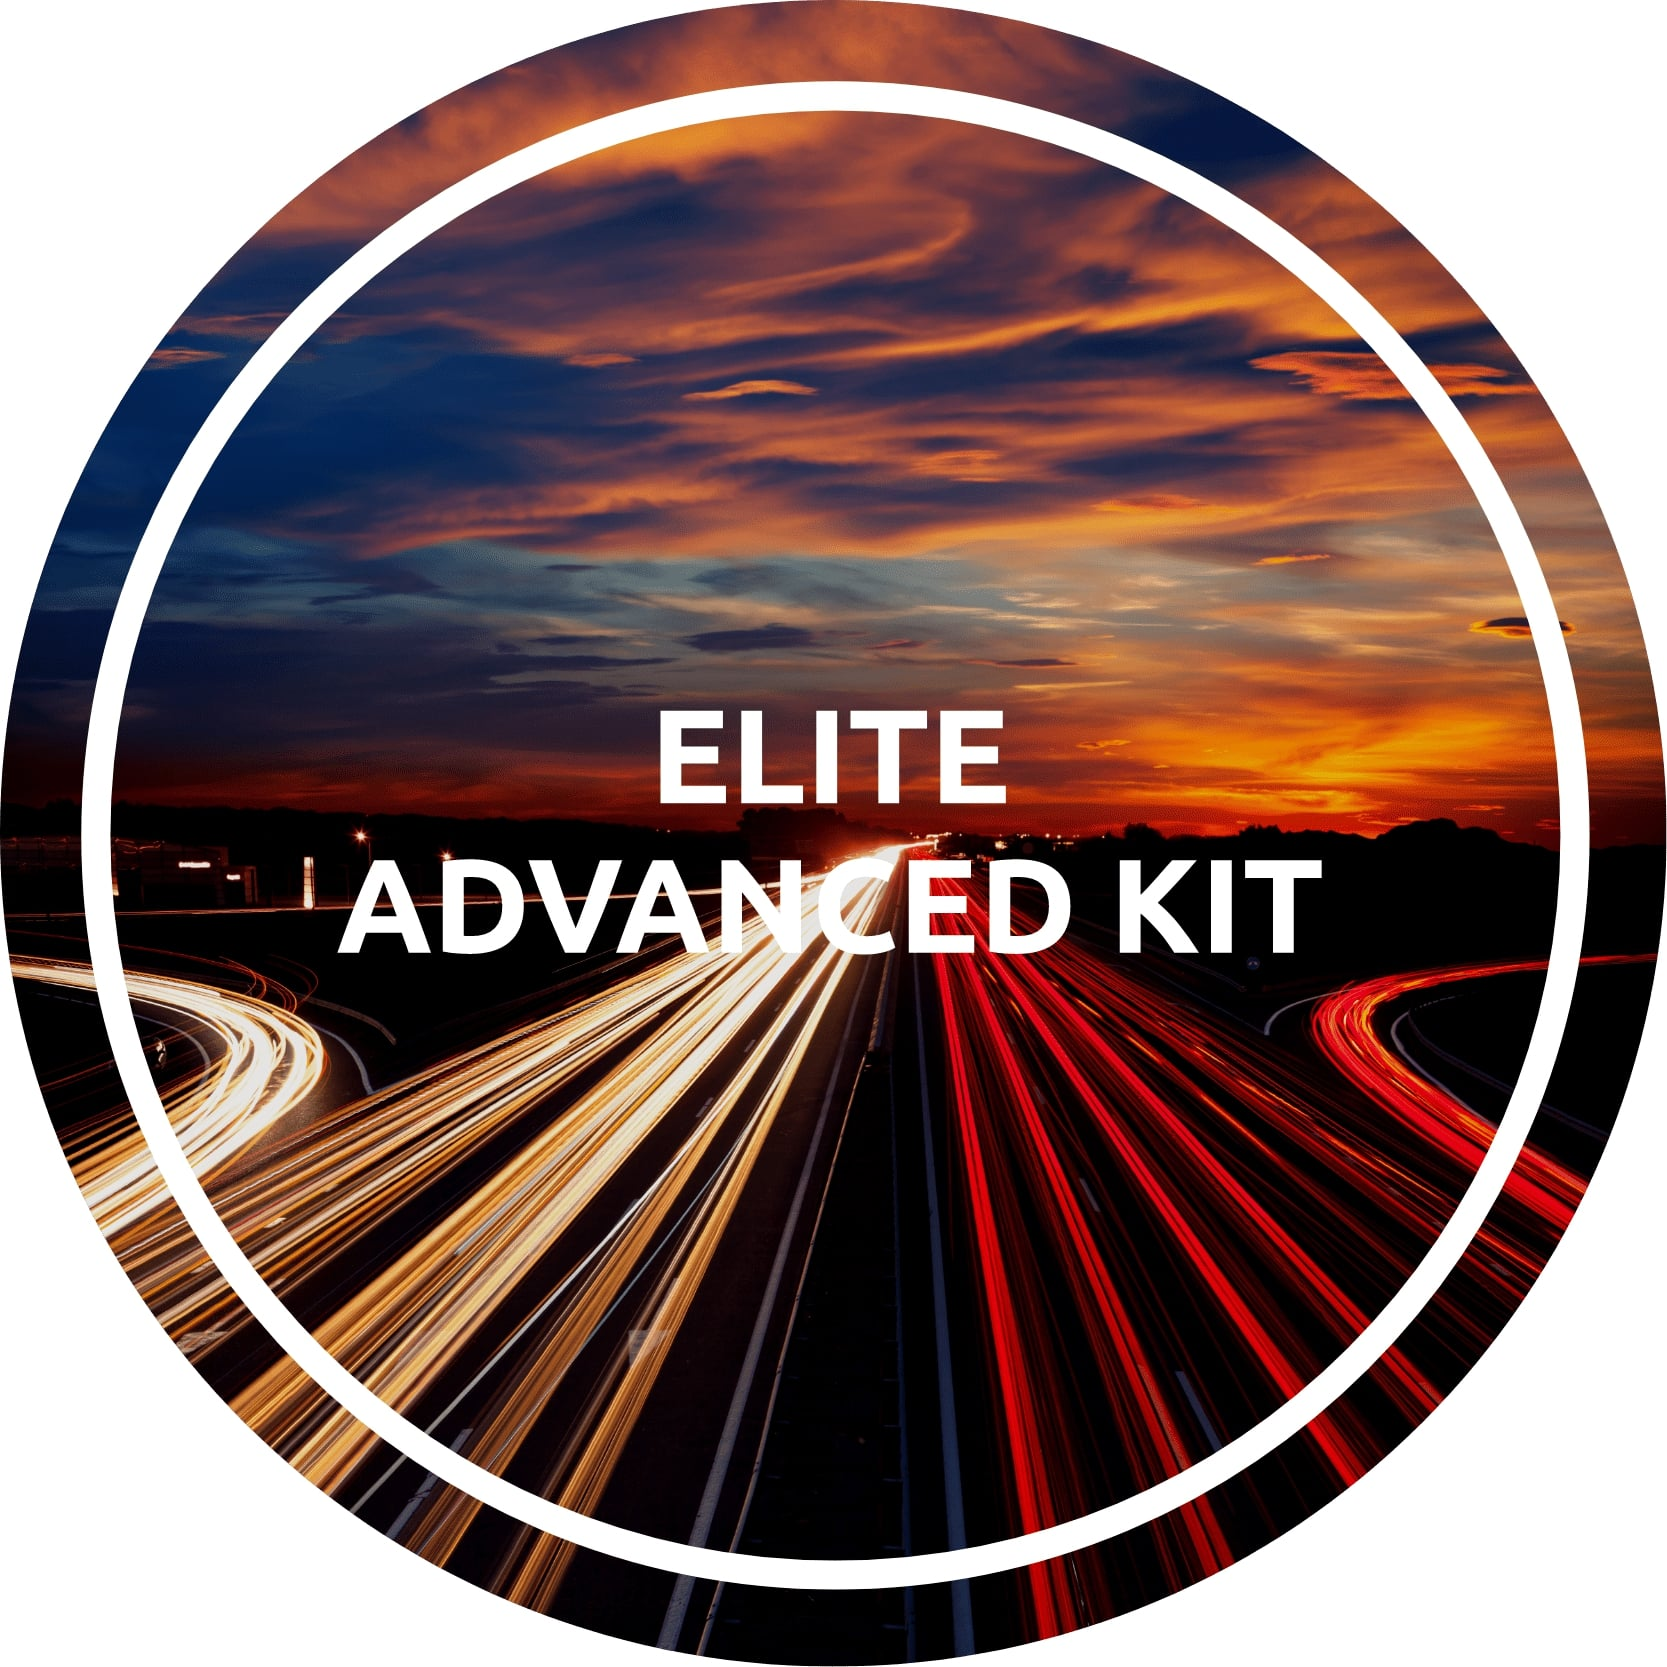 Elite Advanced Kit